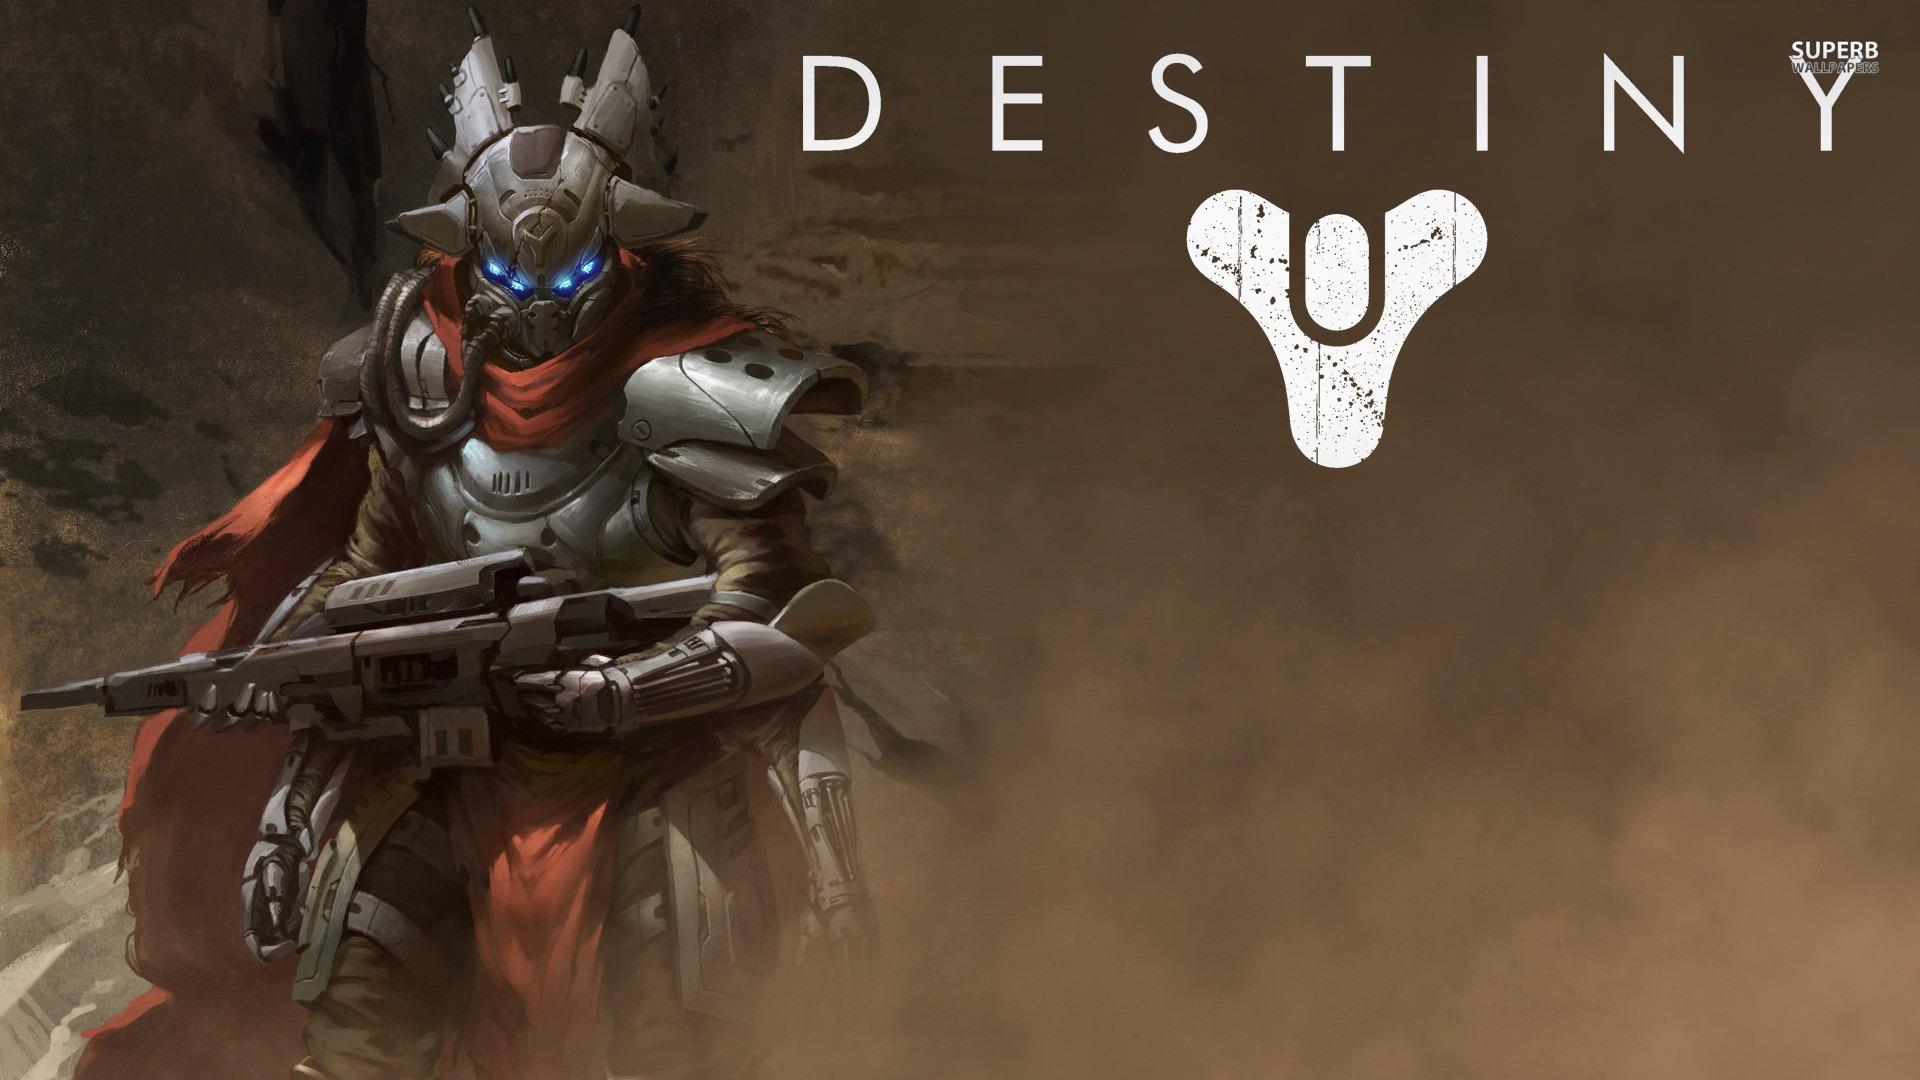 Destiny wallpaper 1920x1080 jpg